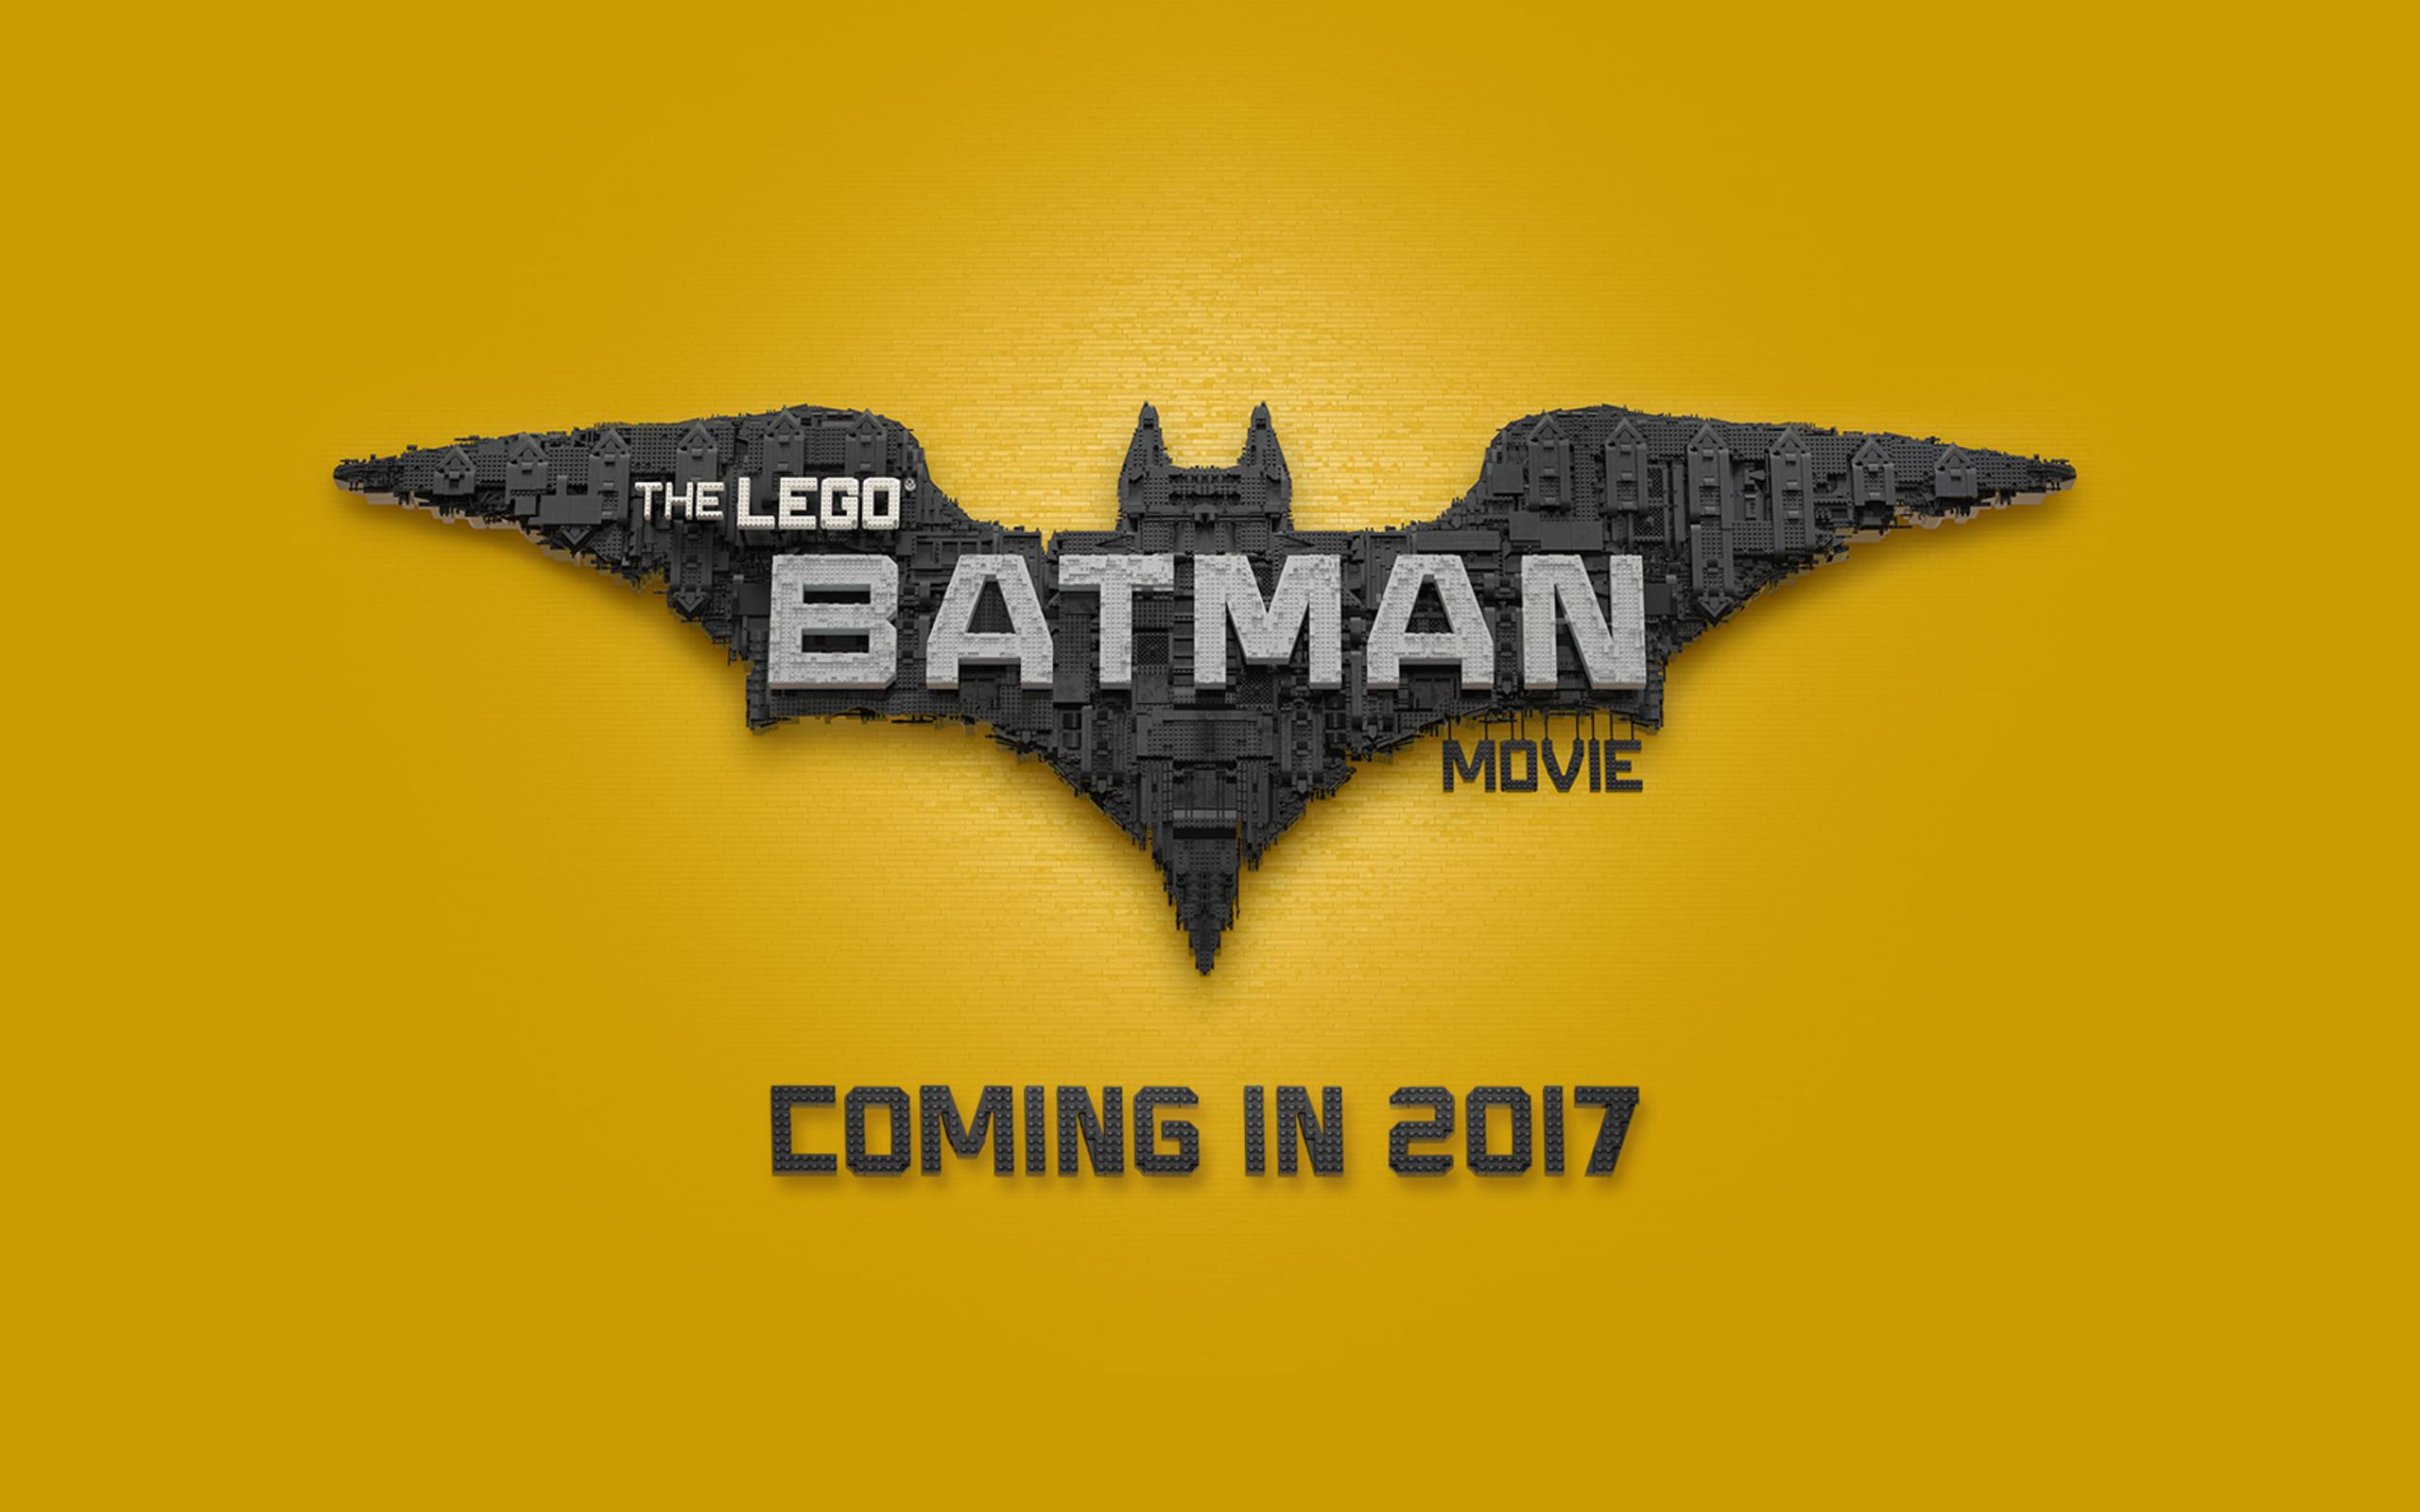 2017-the-lego-batman-movie-wallpaper.jpg